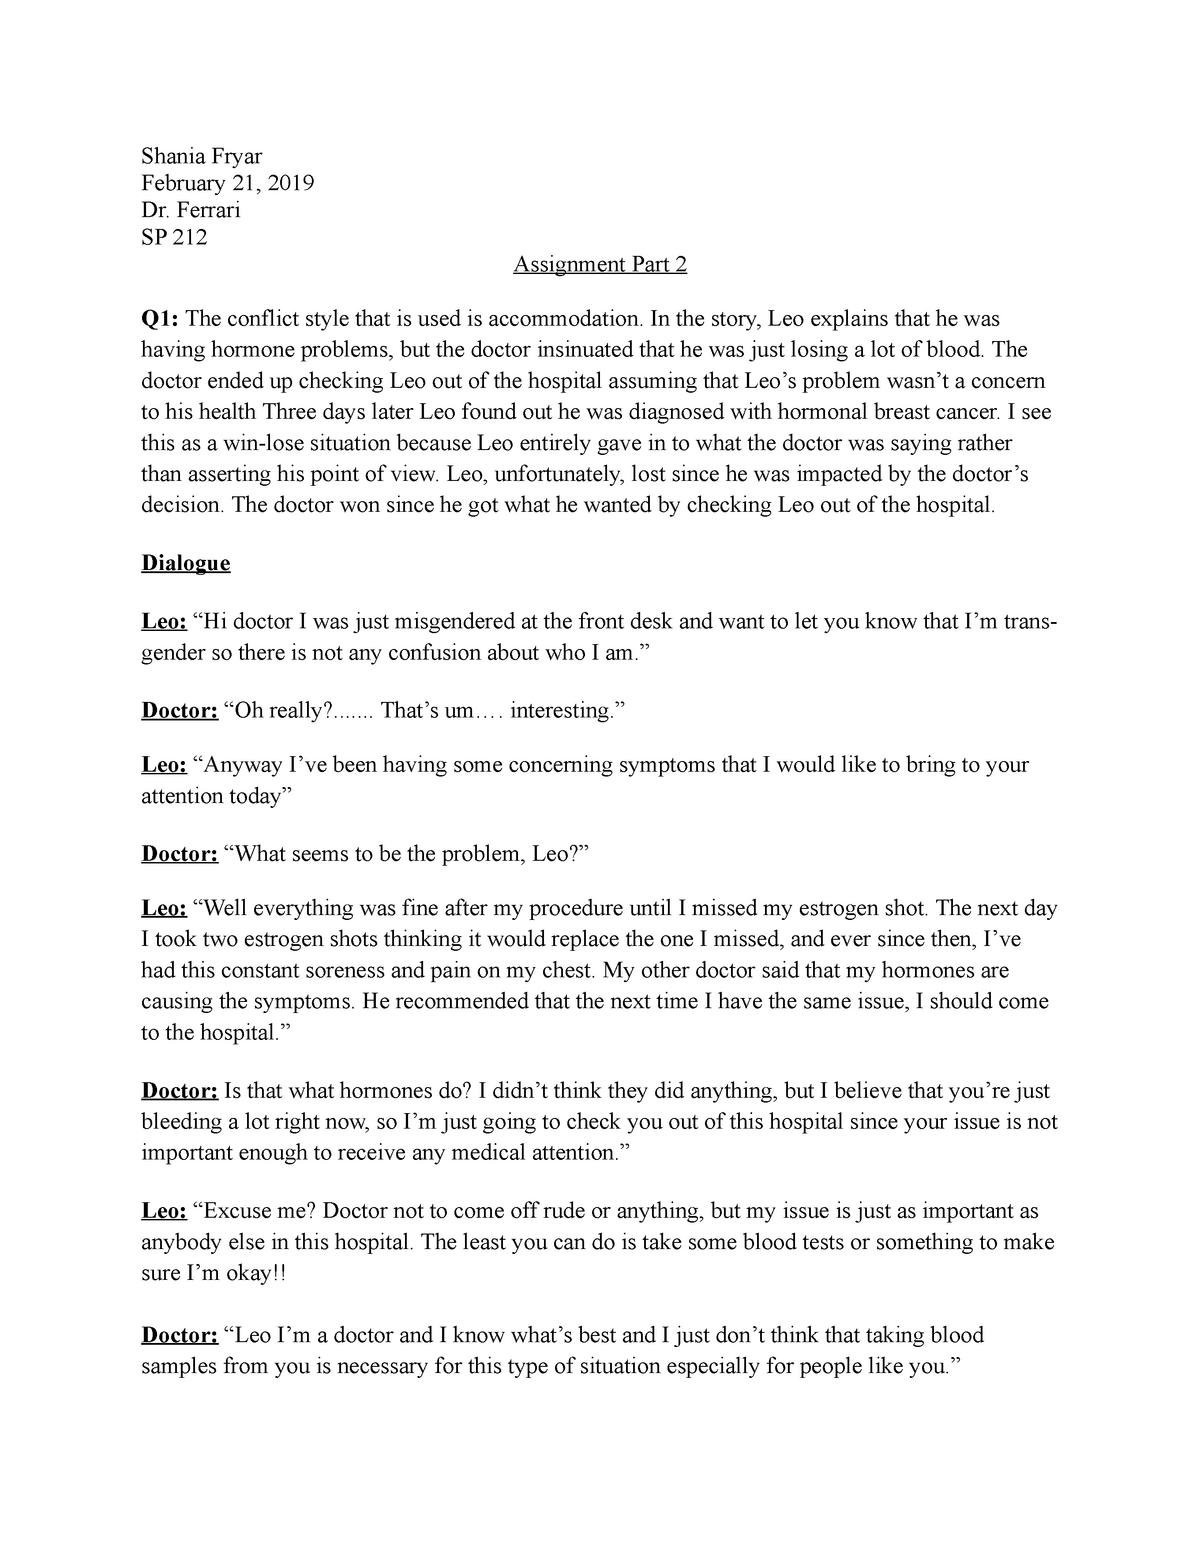 Assignment Part 2 - SP 20: Improving Speech Skills - StuDocu